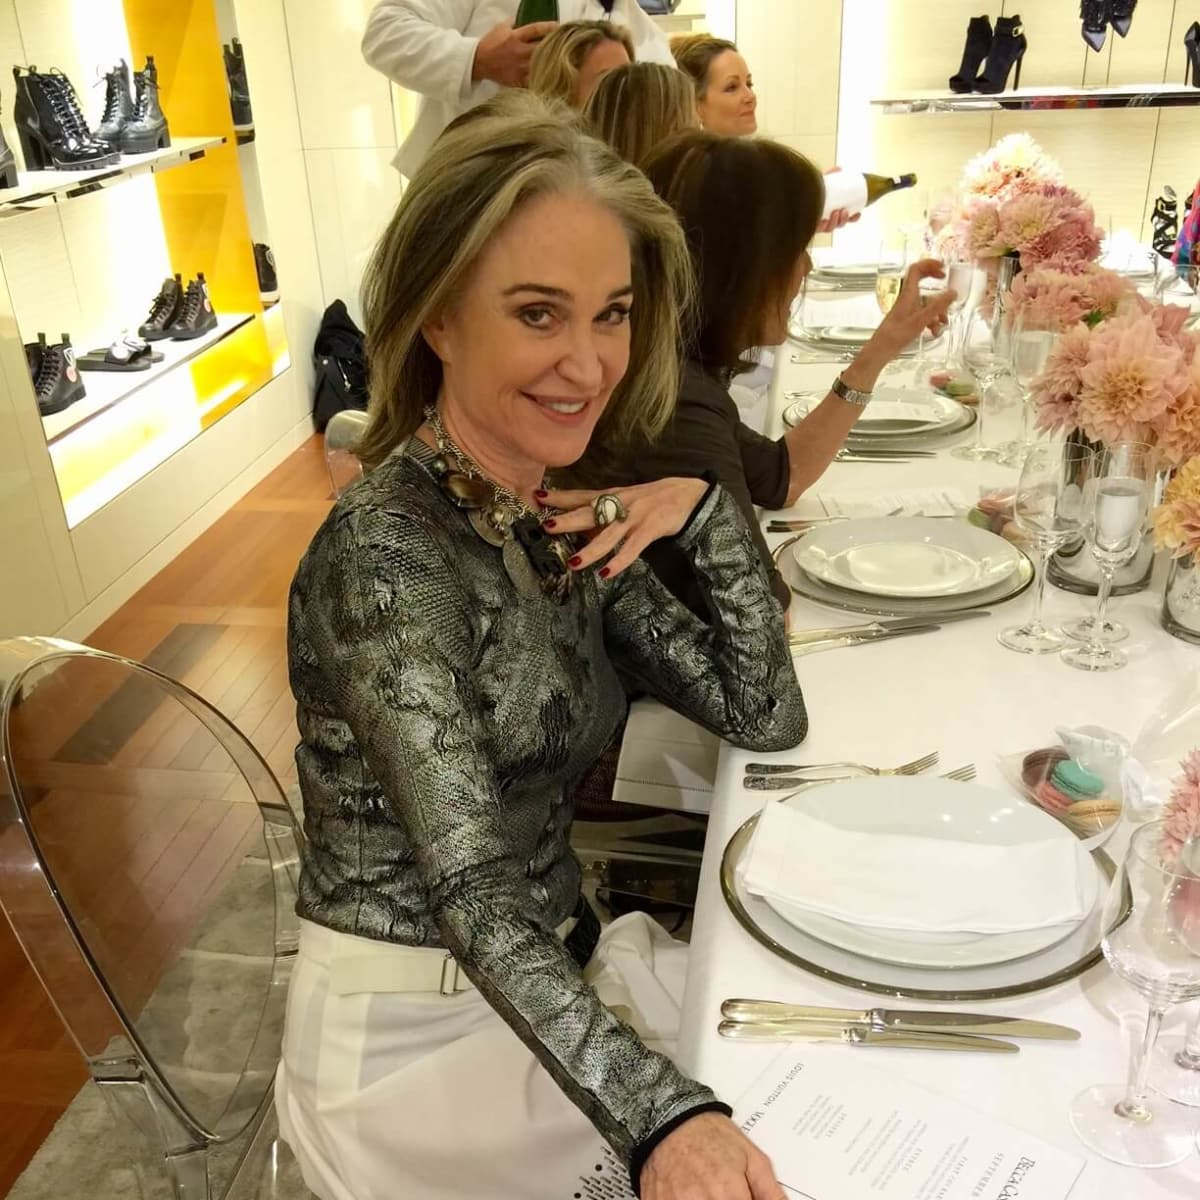 Vogue, Louis Vuitton lunch, 9/26 Becca Cason Thrash